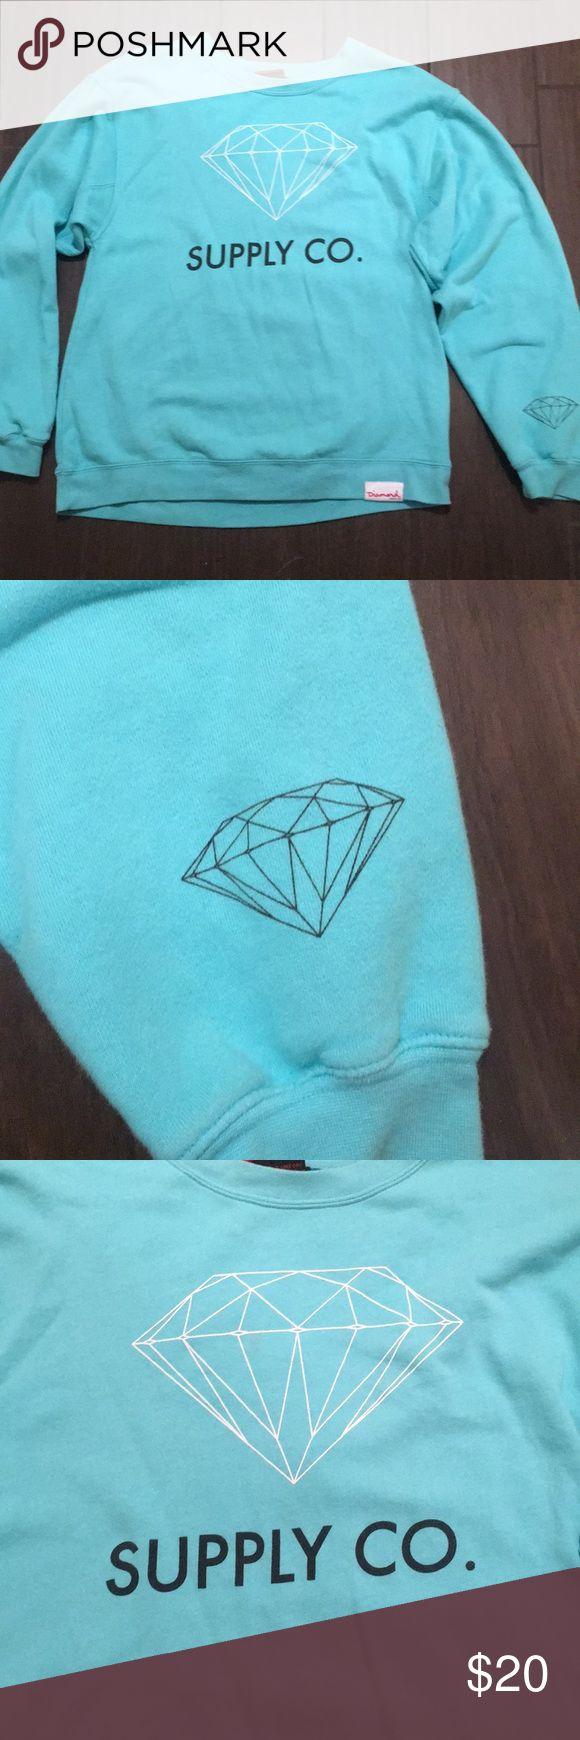 Diamond Supply Co. women's crew neck sweatshirt Diamond Supply Co. turquoise crew neck sweatshirt. Size XL. In great condition! Diamond Supply Co. Sweaters Crew & Scoop Necks